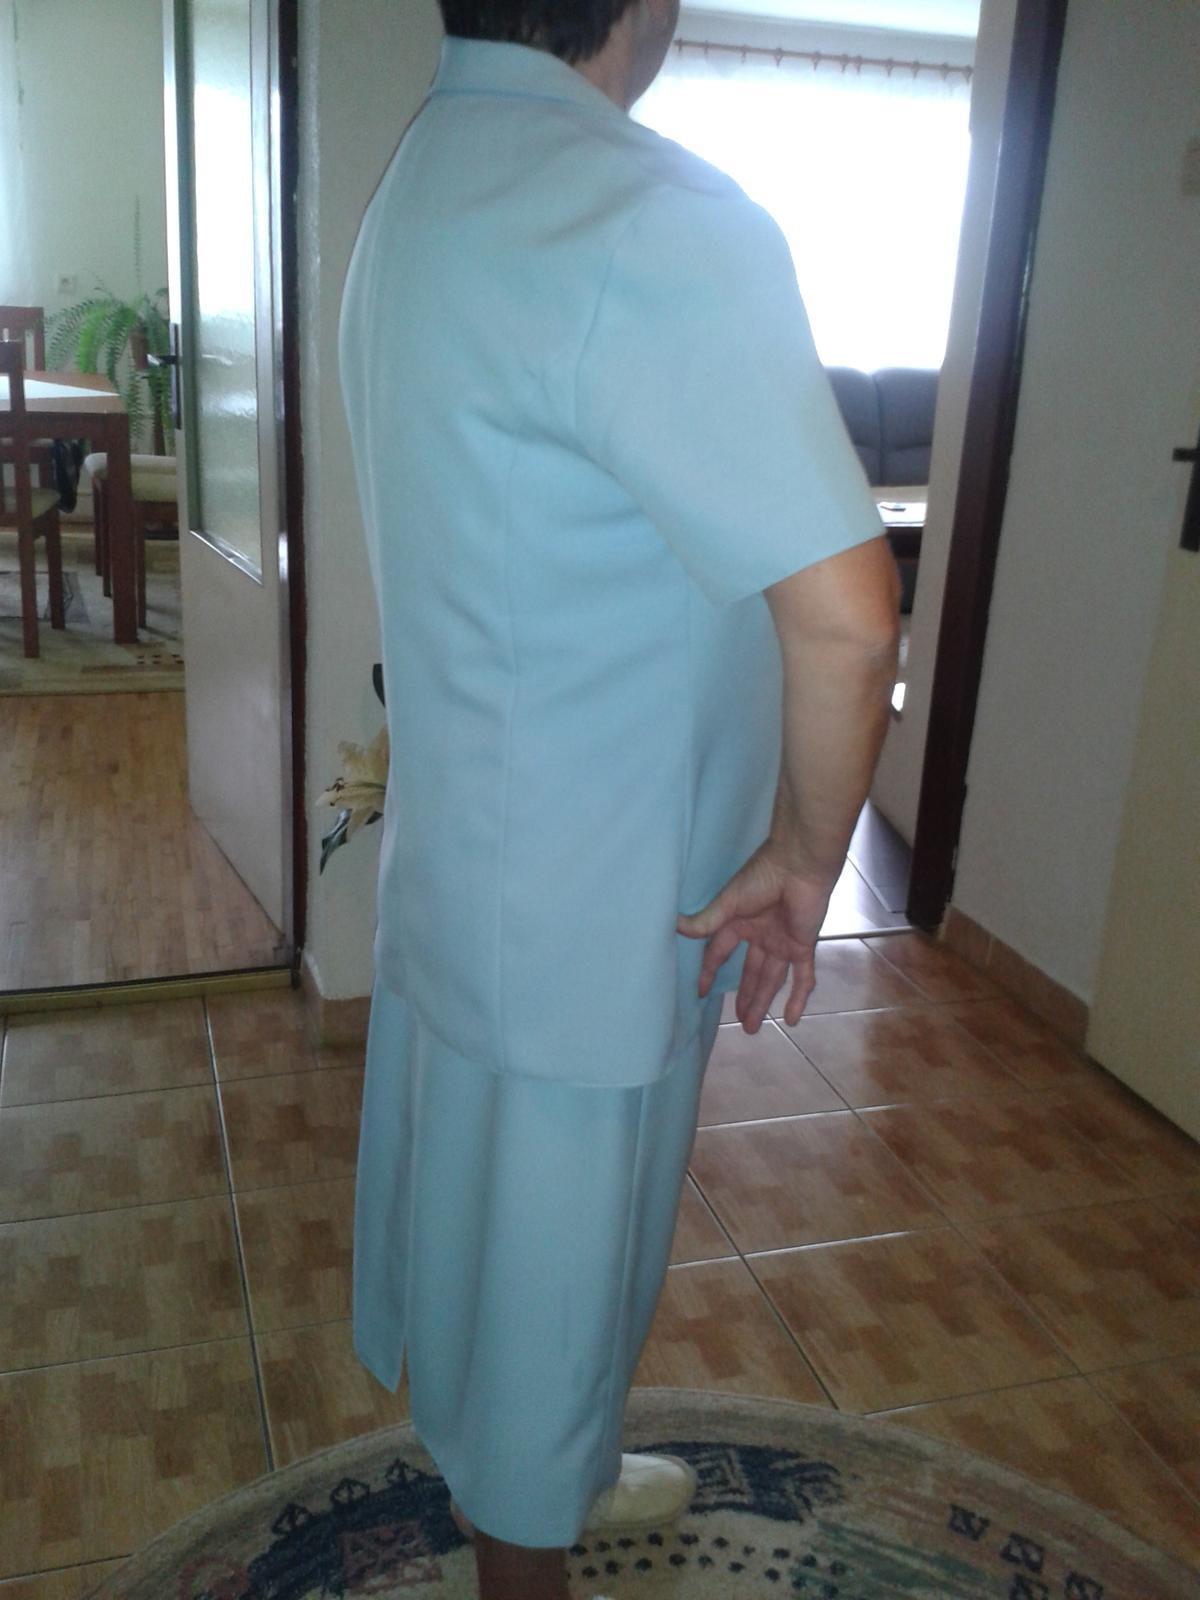 dámsky kostým - Obrázok č. 3